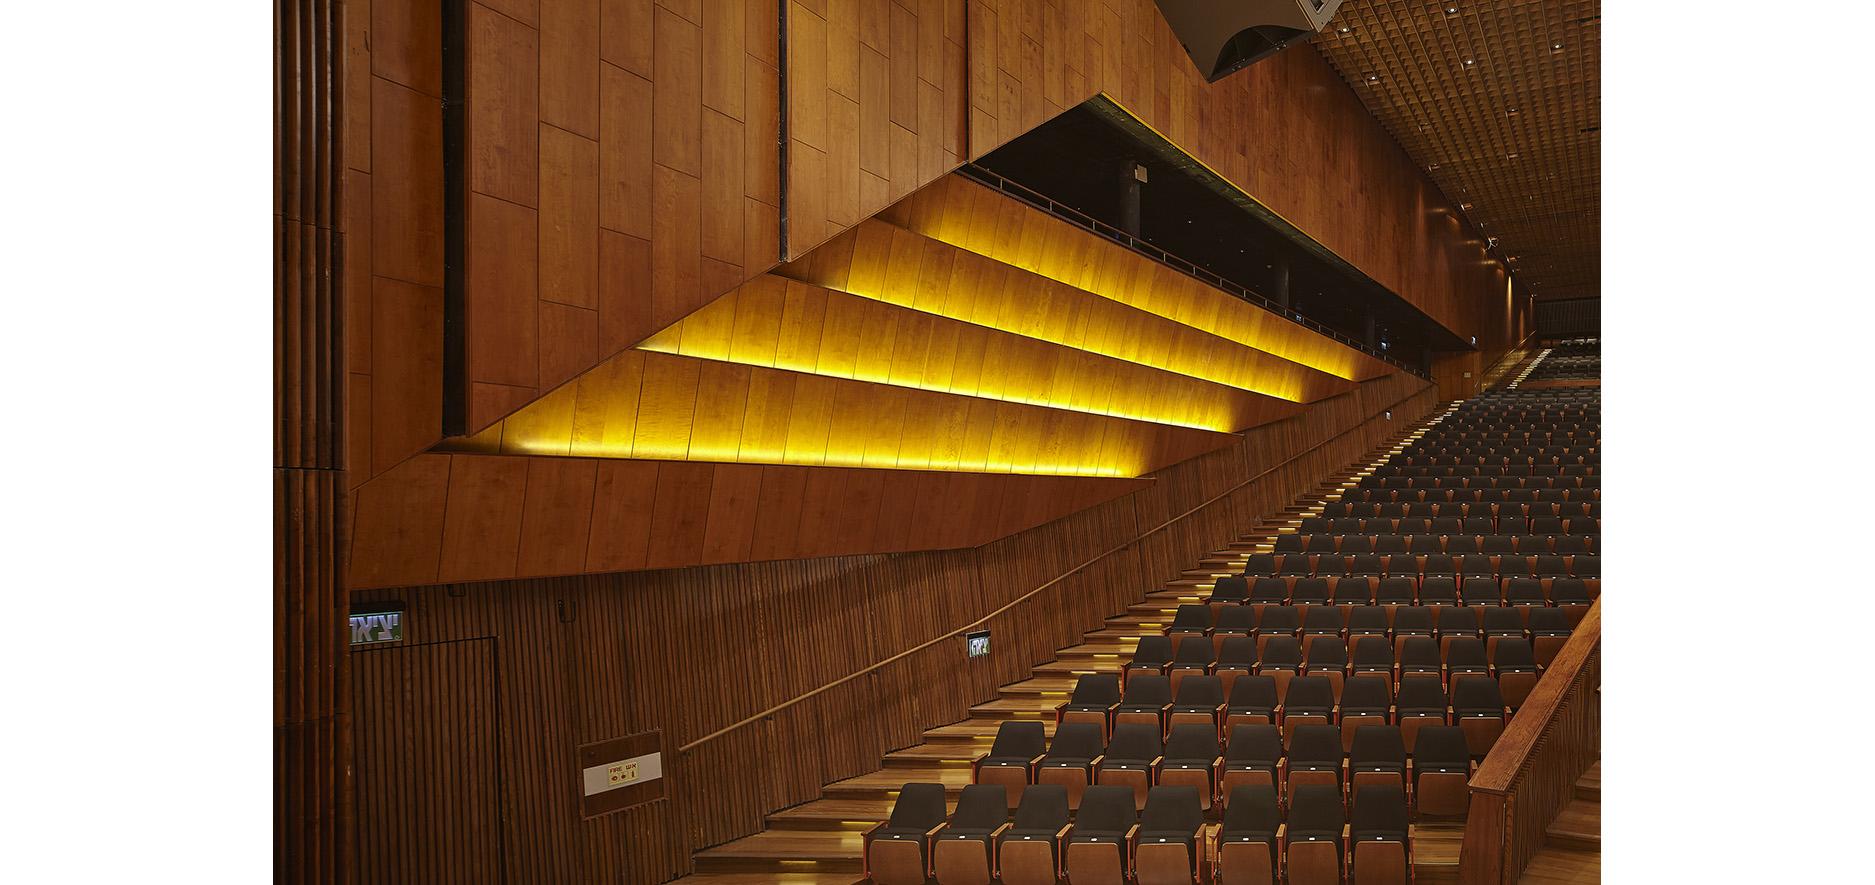 Heichal_HaTarbut_TLV_By_Kolker_Epstein_Architects009